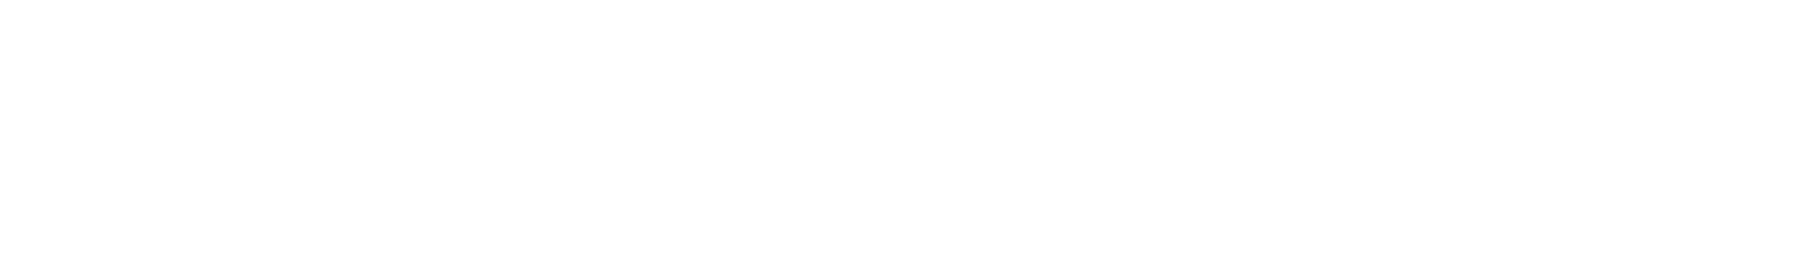 bluezone bc0210 percussion miscellaneous 008